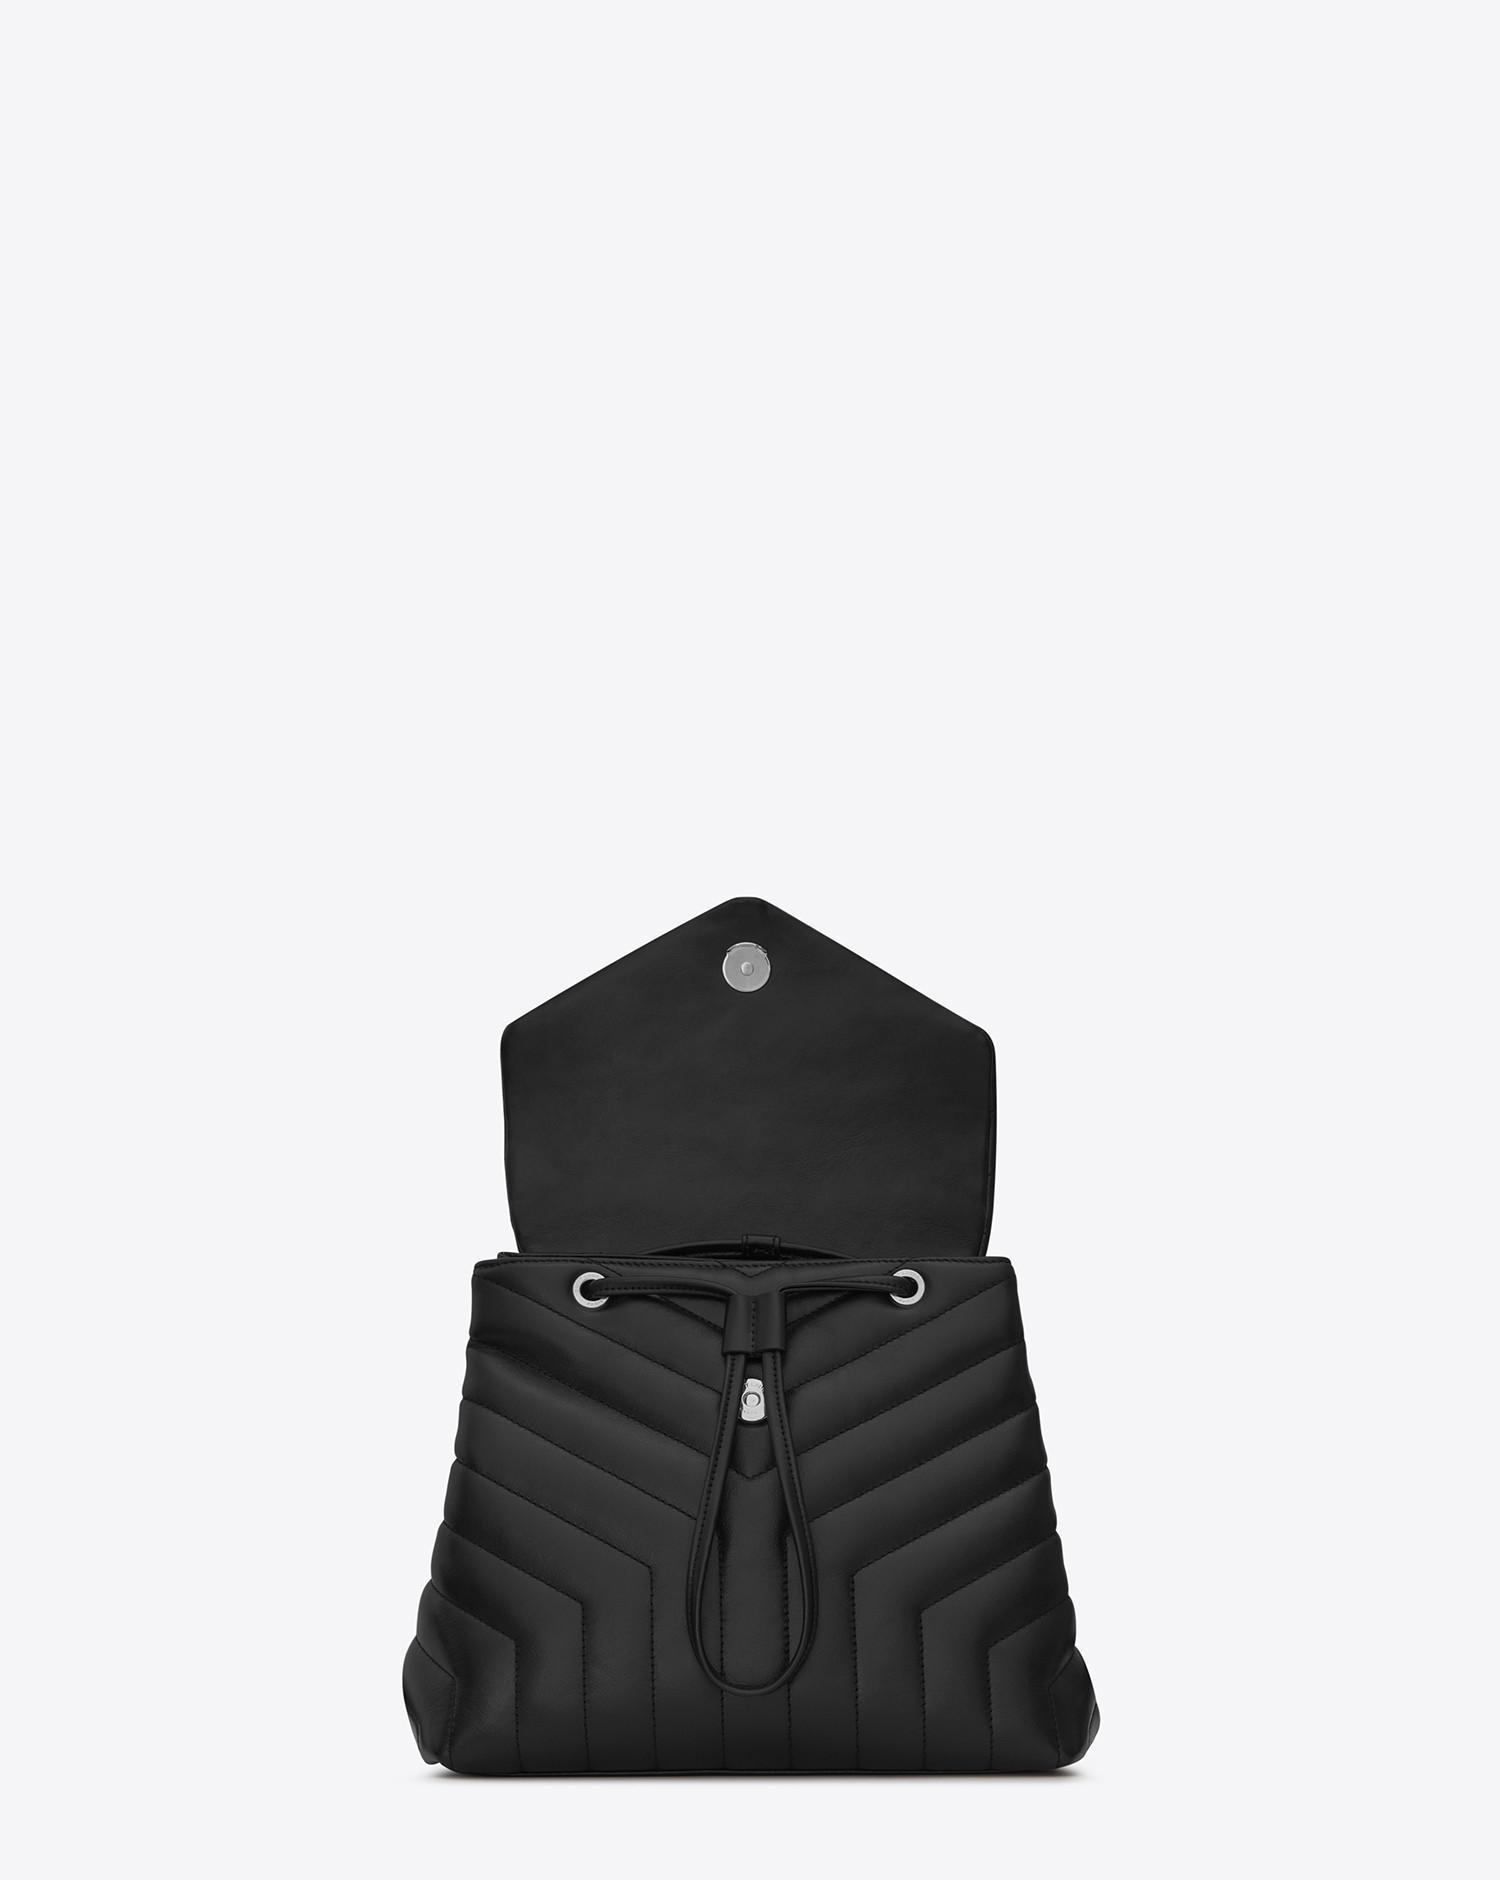 9c45cd5f16 Lyst - Saint Laurent Loulou Small Backpack In Matelassé